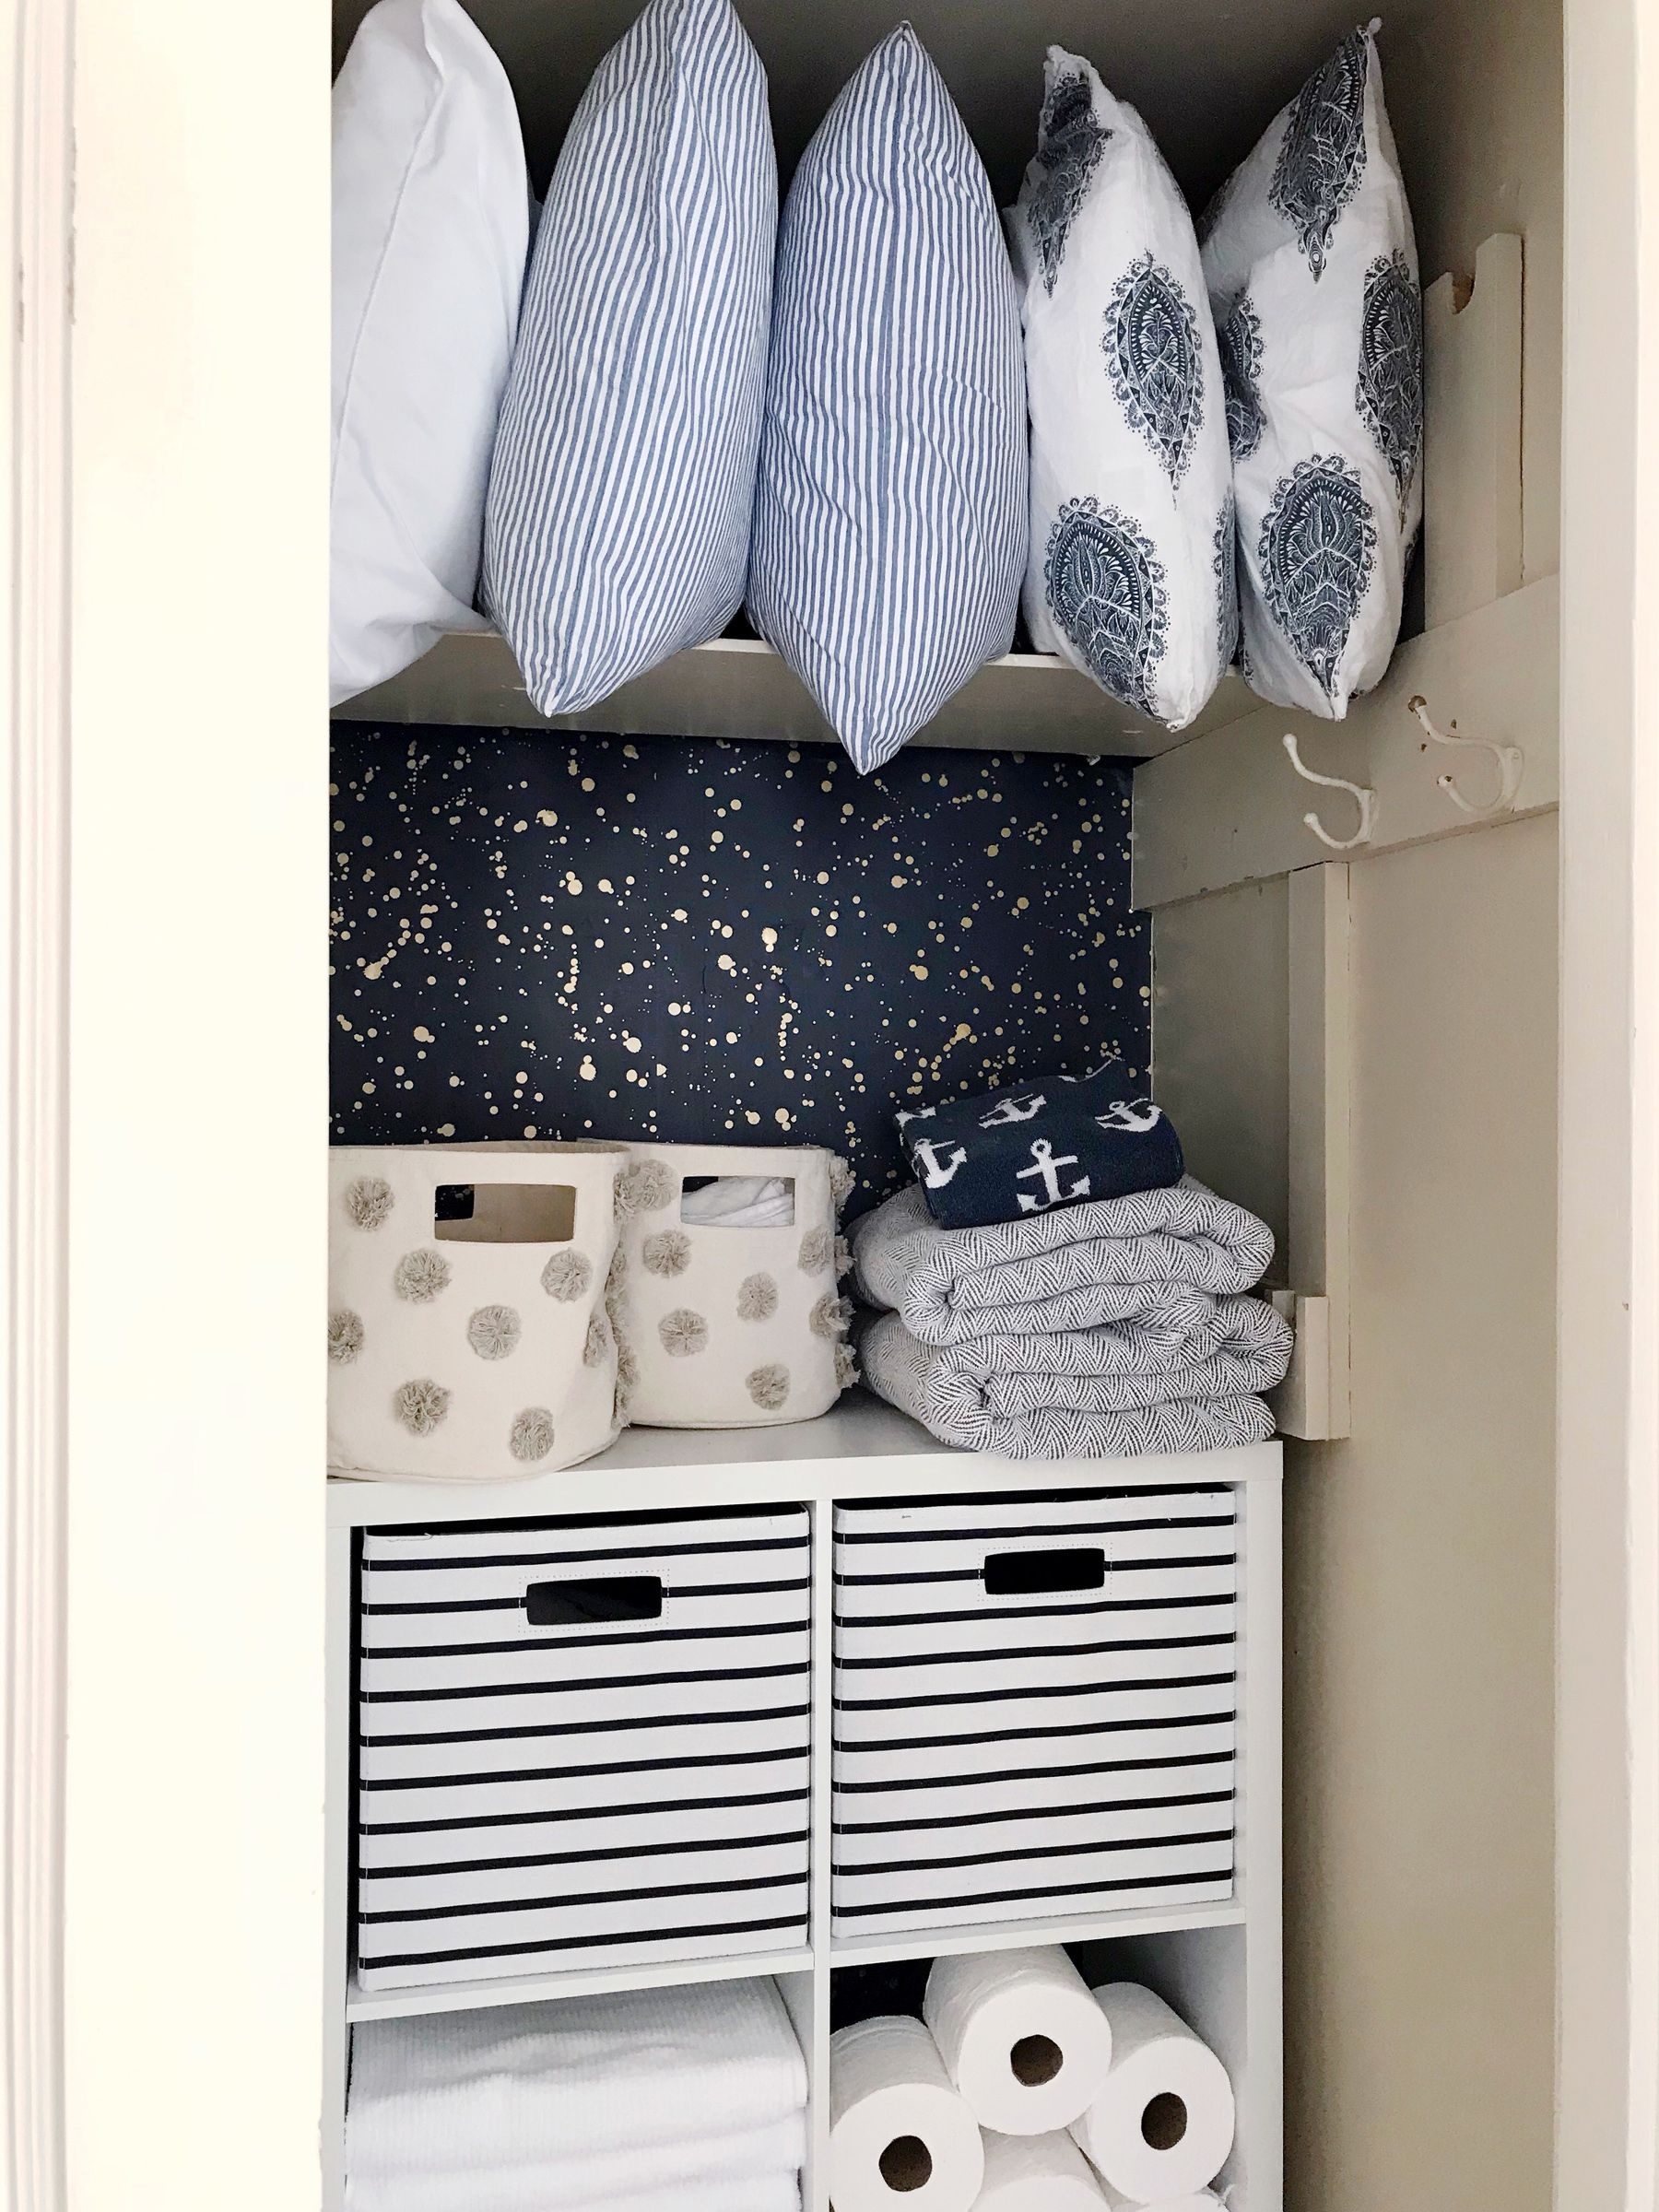 Linen Closet Makeover Domestikatedlife Linen Closet Organization Linen Closet Makeover Linen Closet